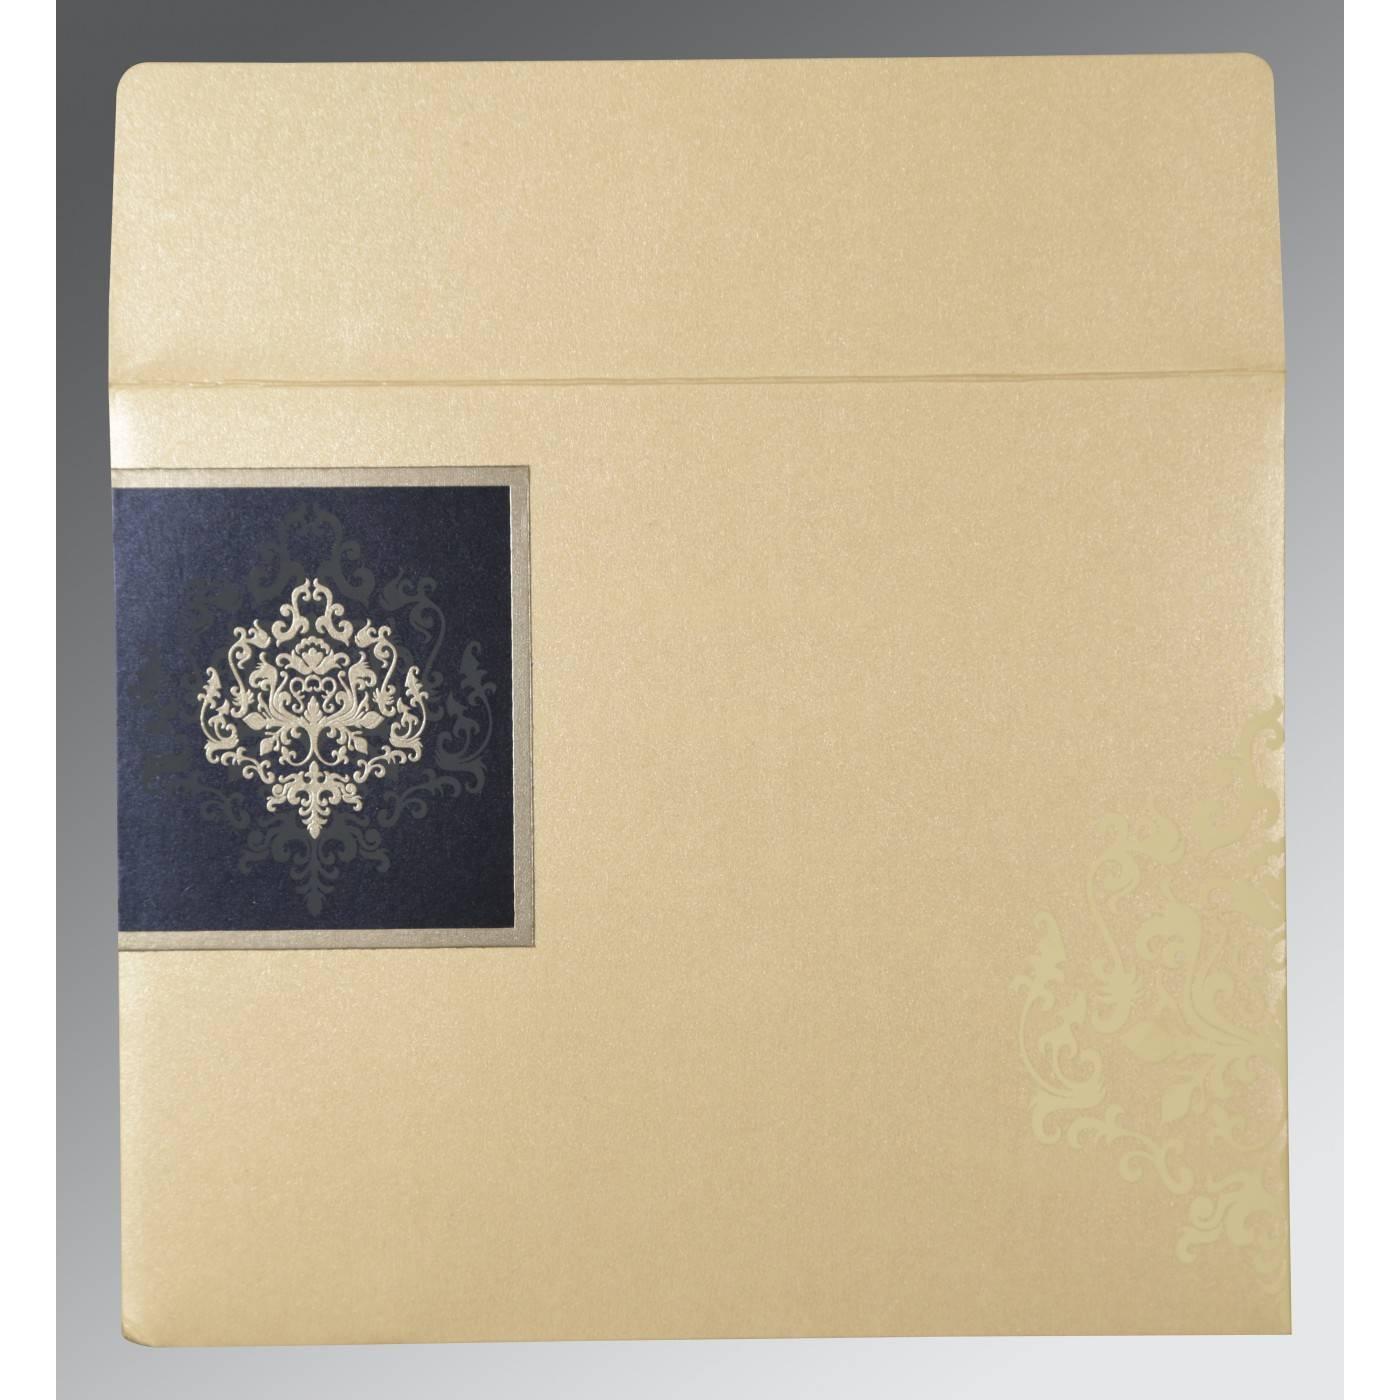 IVORY BLUE SHIMMERY DAMASK THEMED - SCREEN PRINTED WEDDING CARD : CIN-8253D - IndianWeddingCards